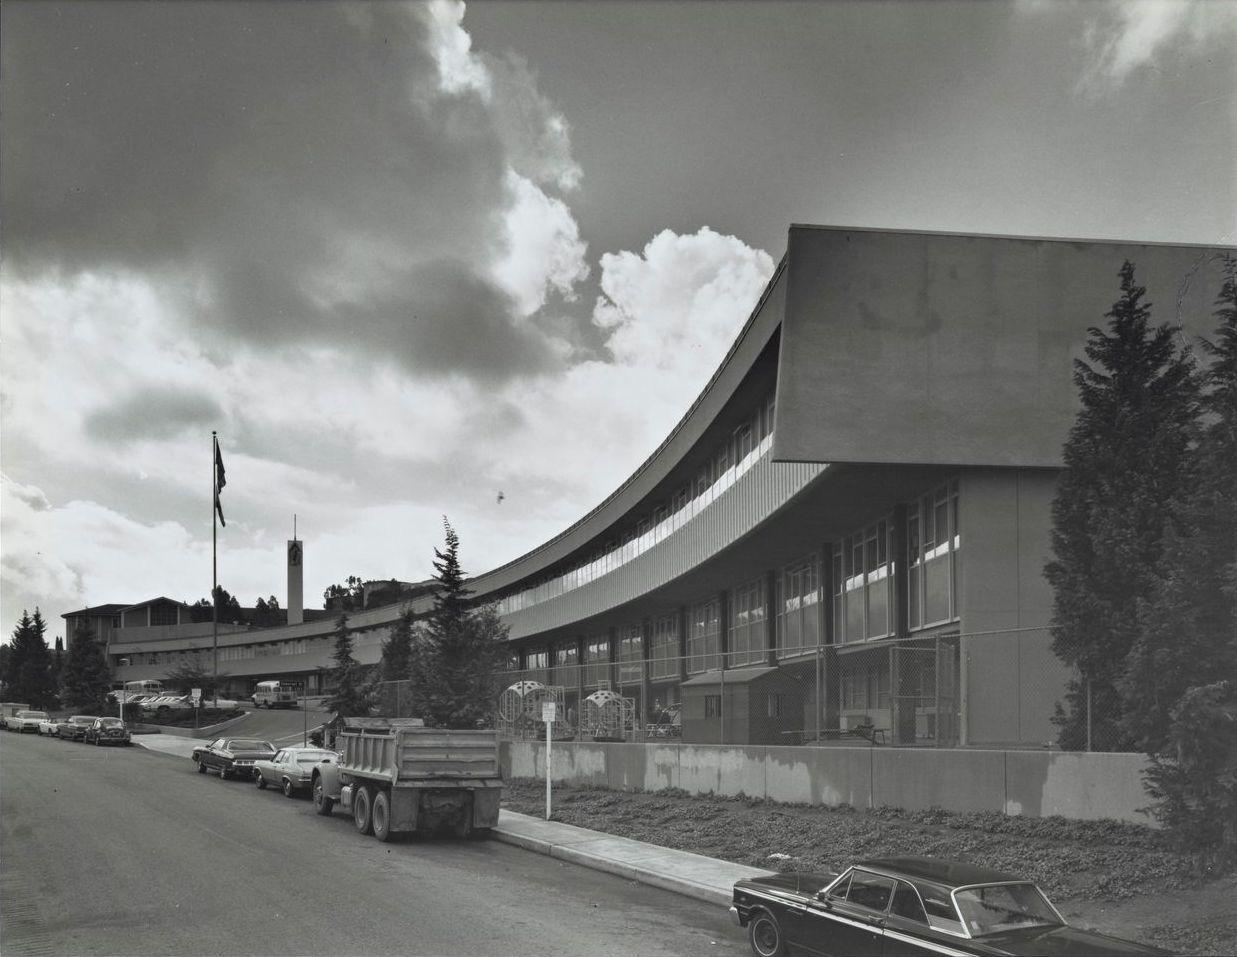 Marlton School (early 1970s?) in Los Angeles, USA, by Sidney Eisenshtat. Photo by Julius Shulman. #Sidney #USA, #School